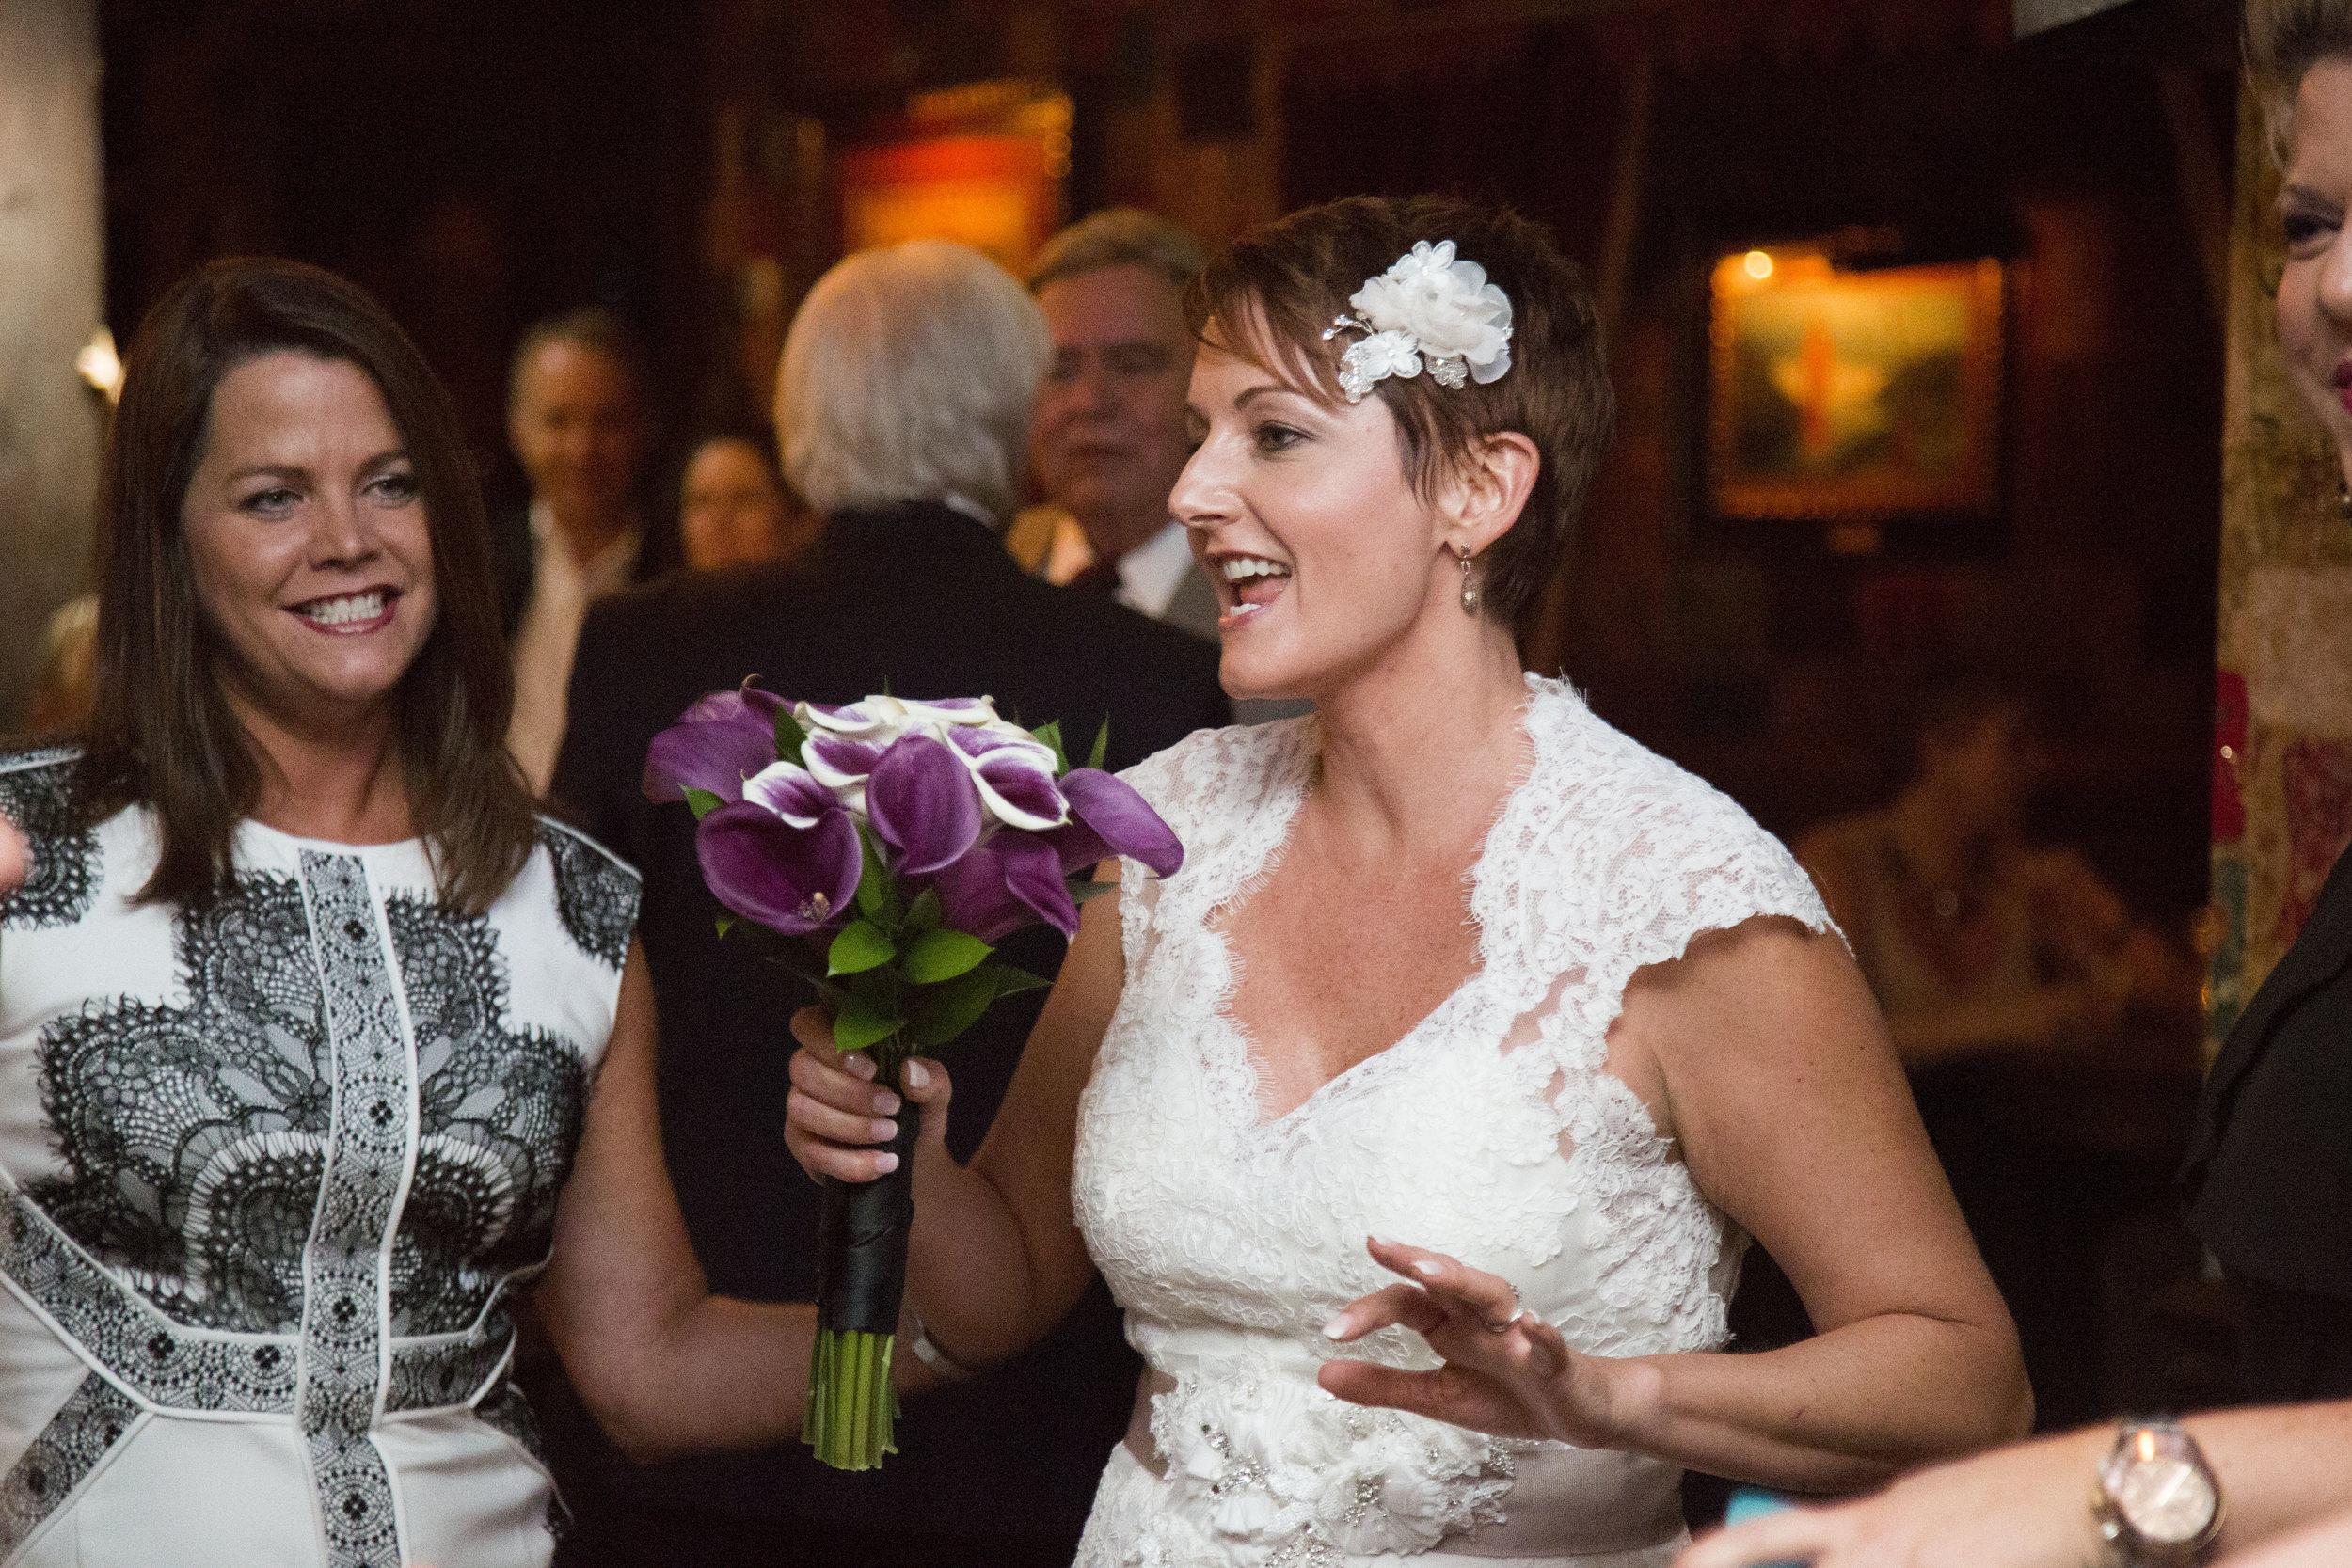 ATGI_Kat and Gabe Wedding 2016_2S8A5691.jpg